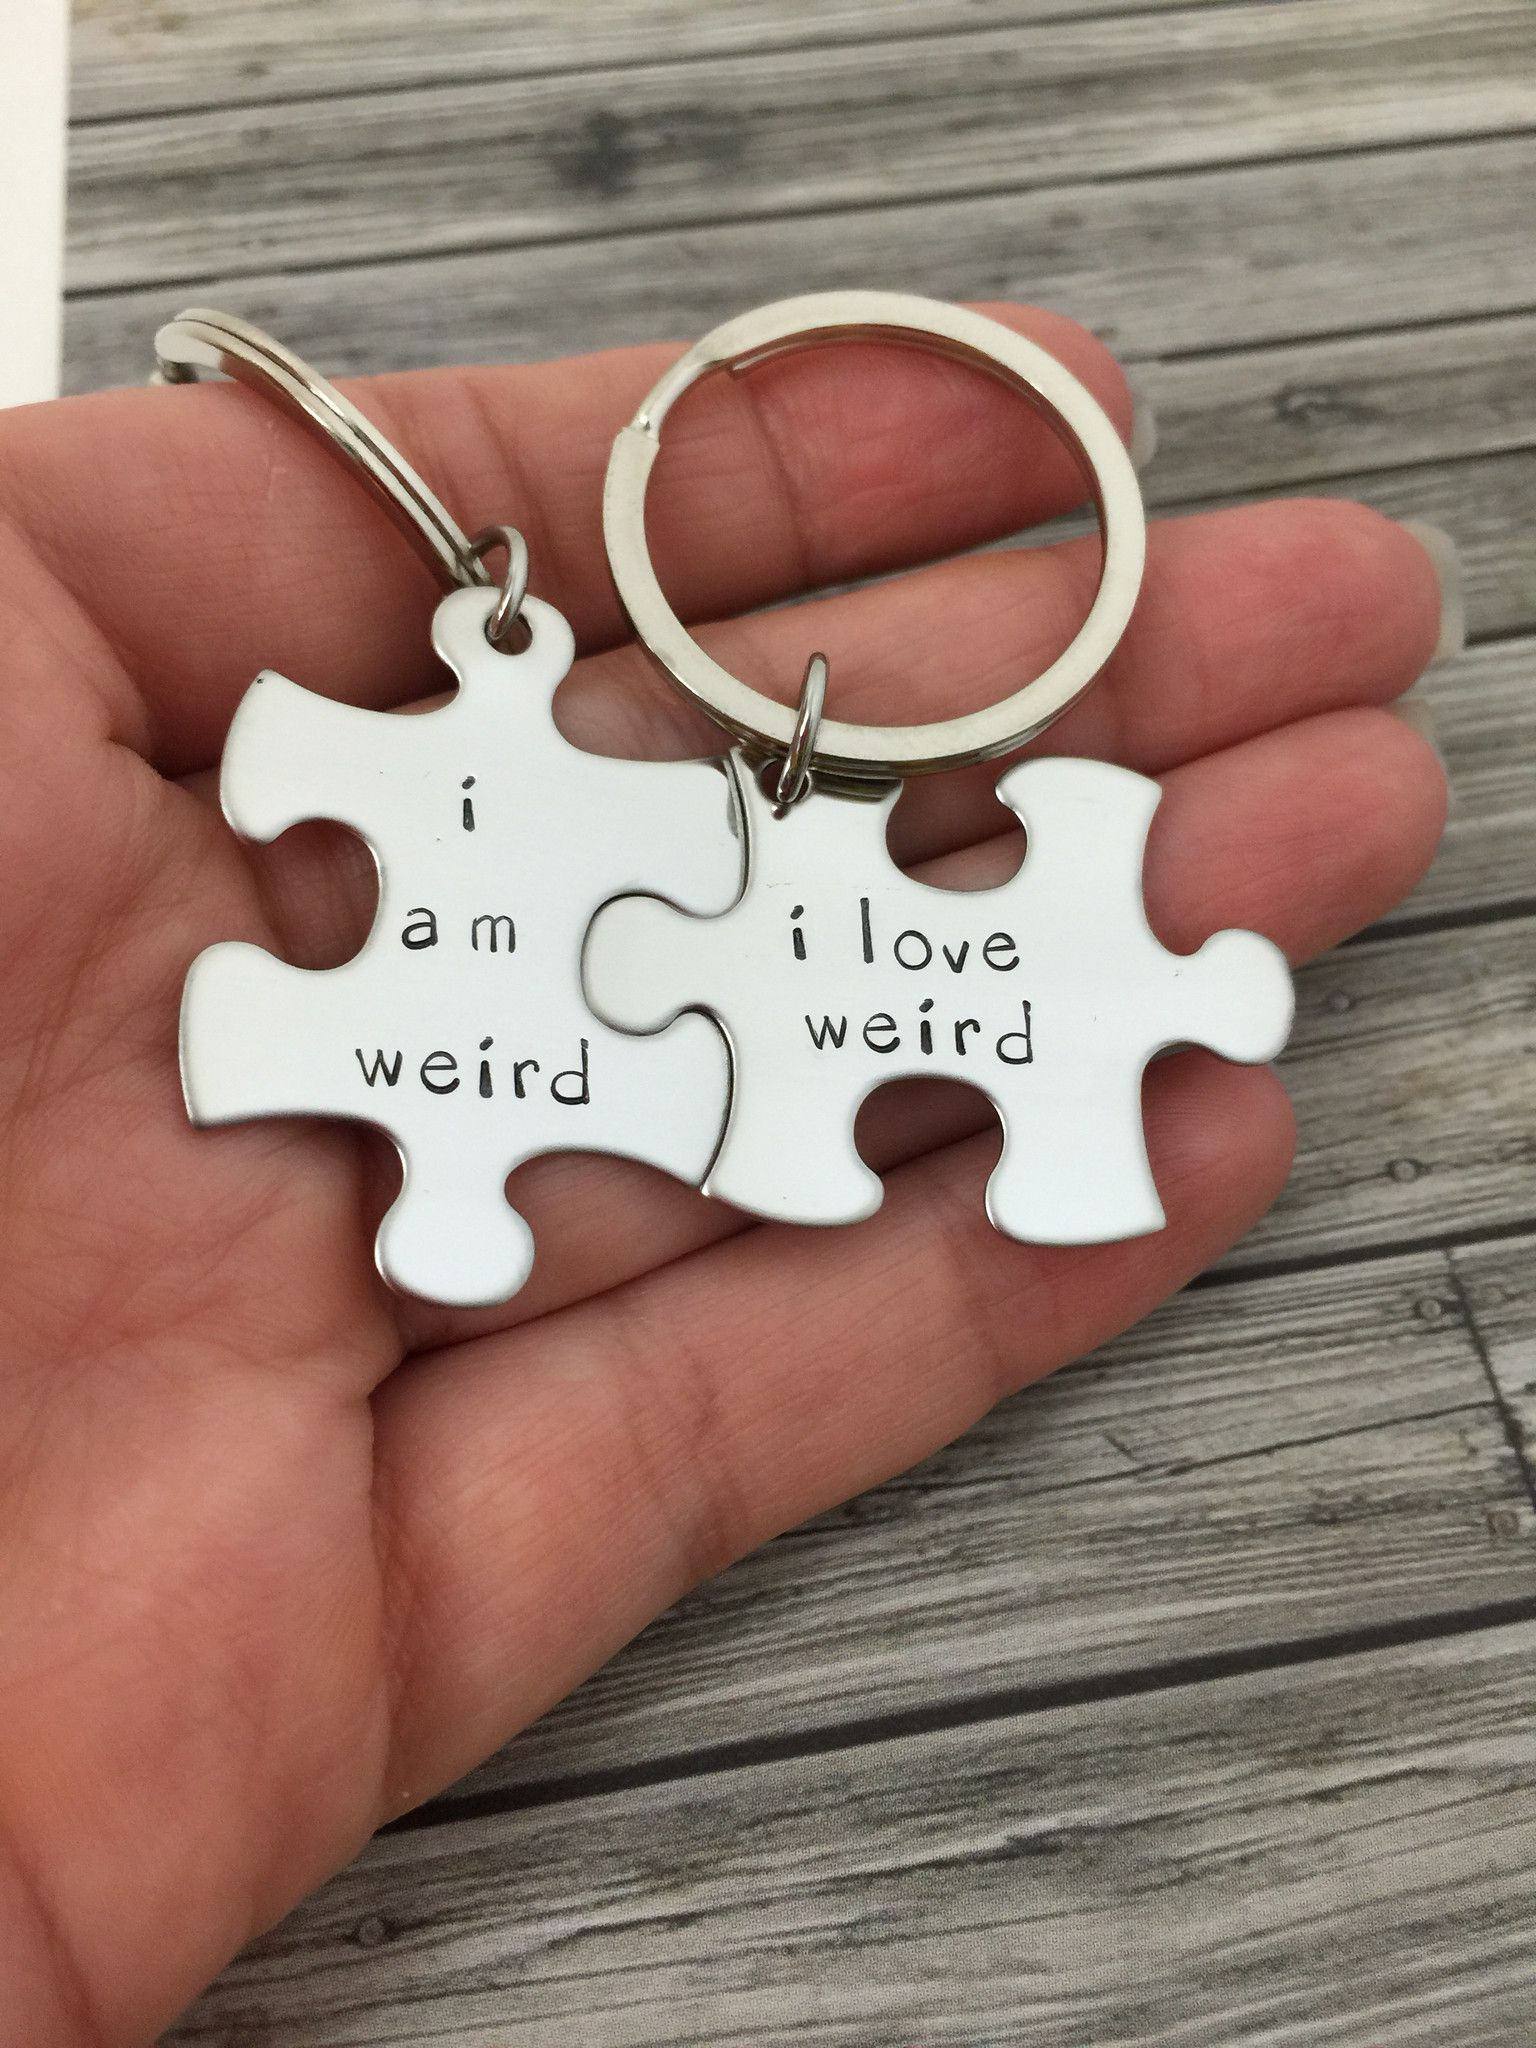 Fun Gift Ideas For Couples  I am weird I love weird Couples Keychains Couples Gift